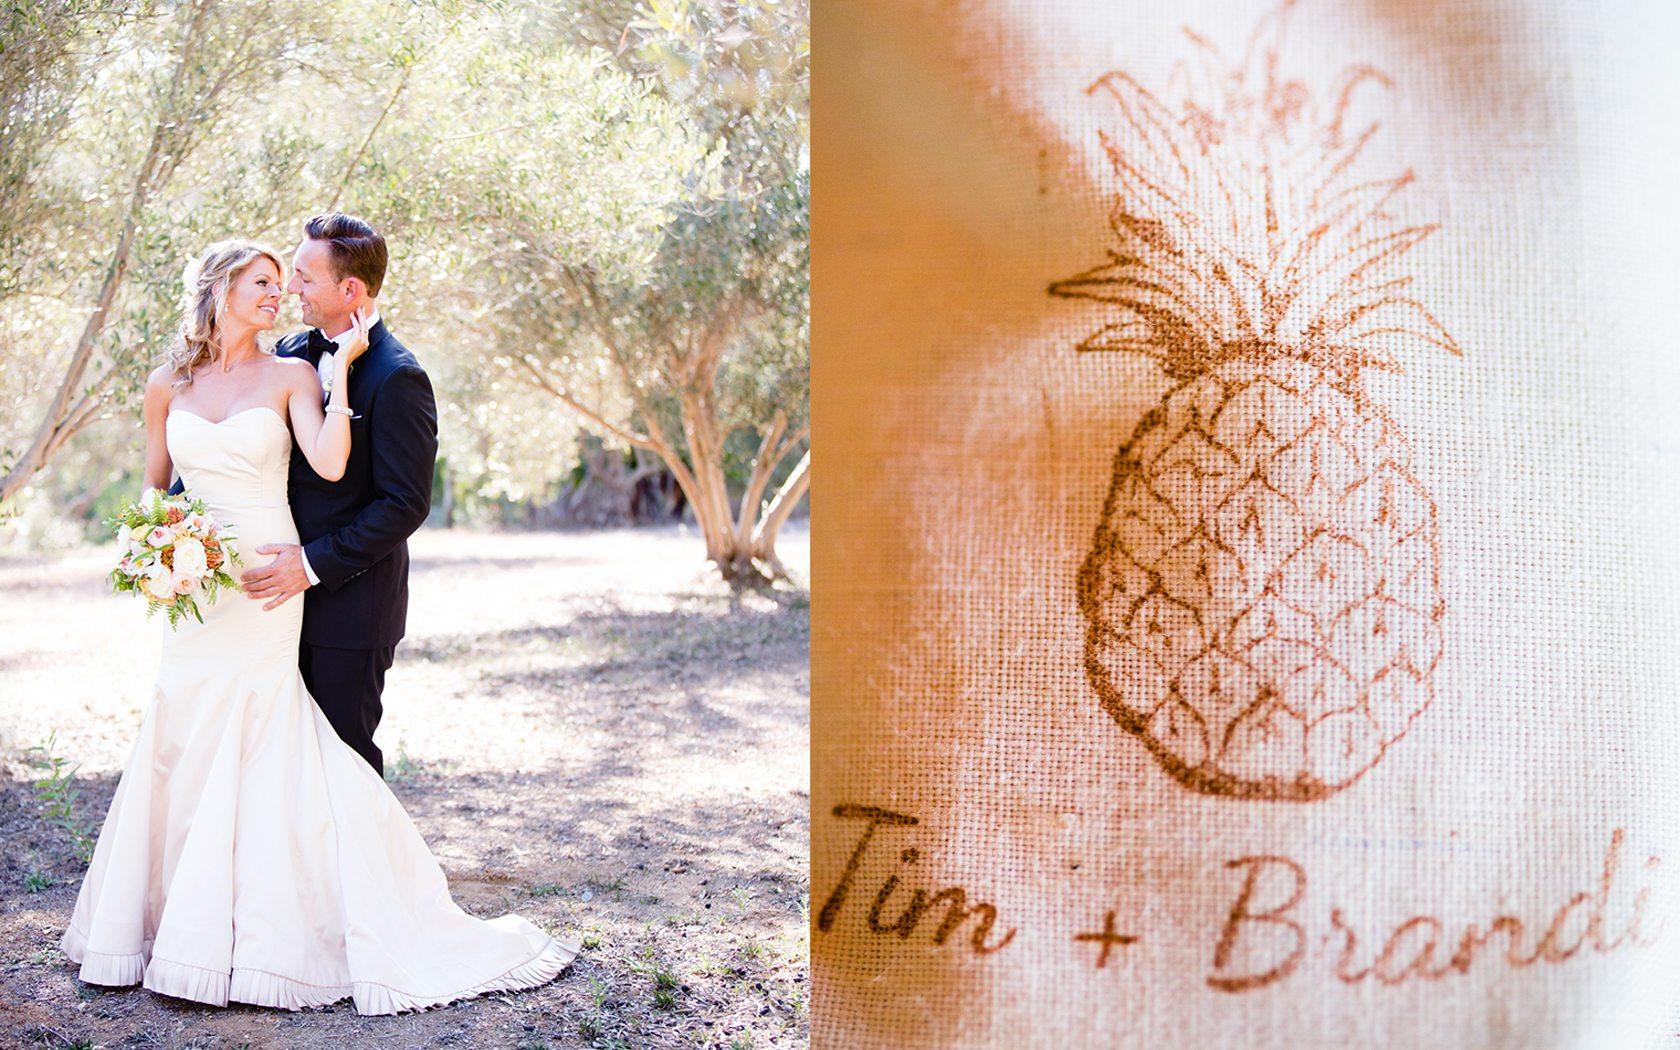 Rancho_Valencia_Resort_Wedding_017.jpg